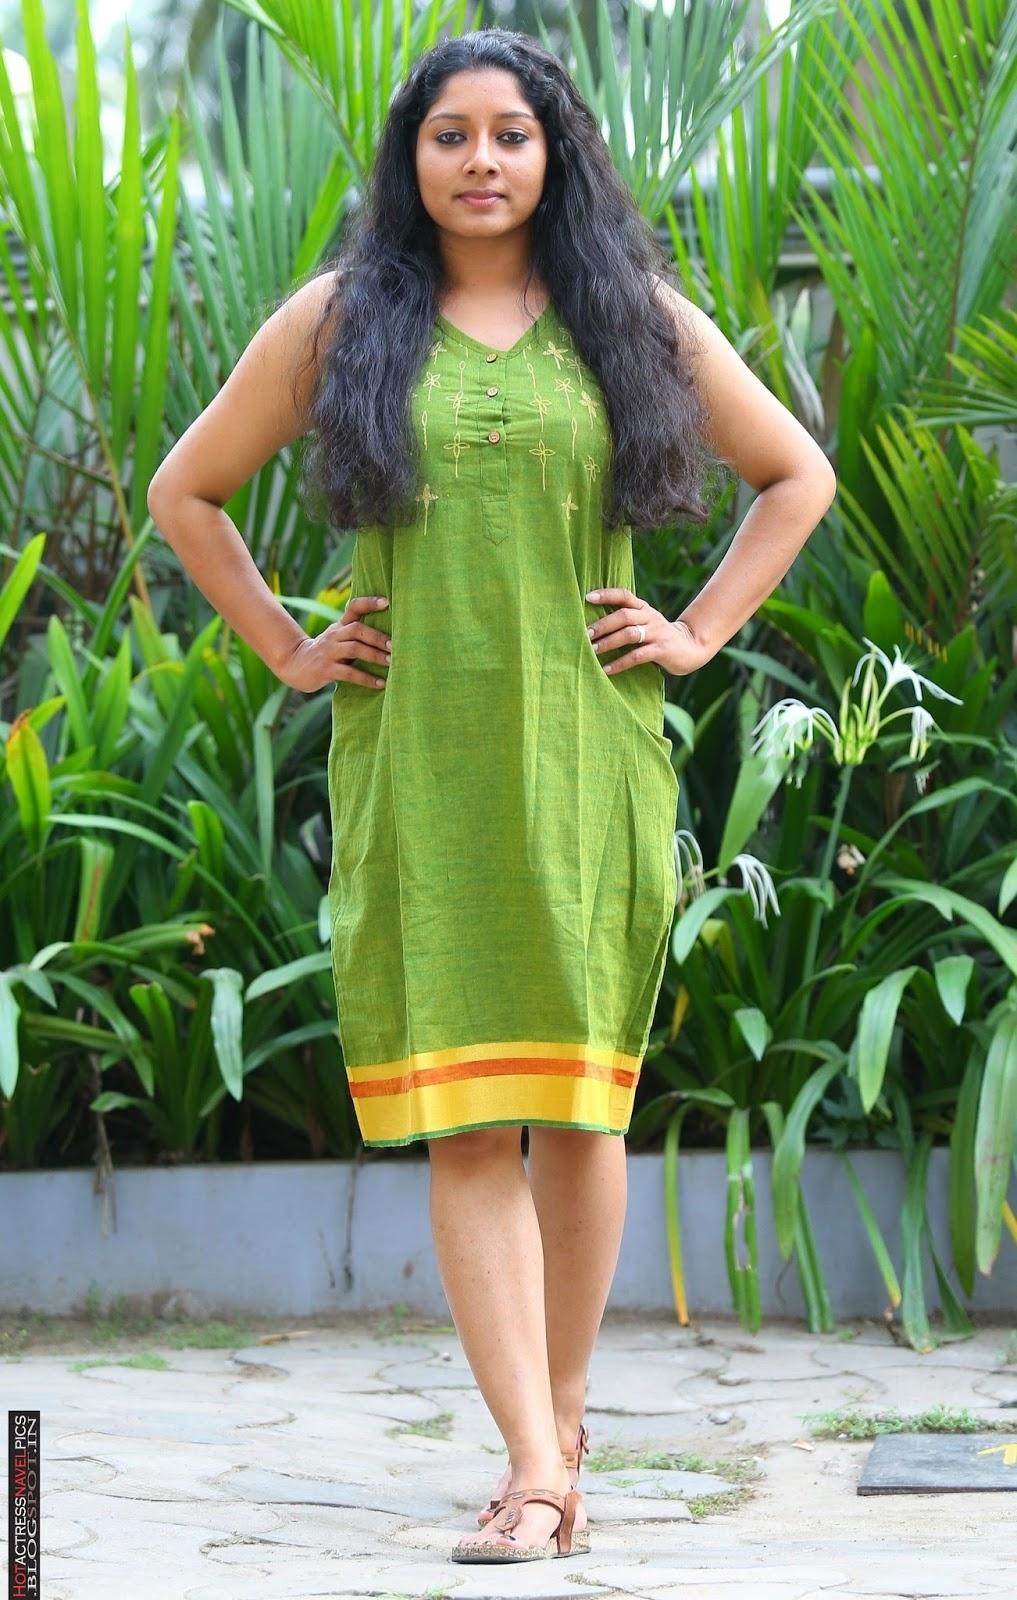 anumol Anumol: My family trusts me: Anumol | Malayalam ...